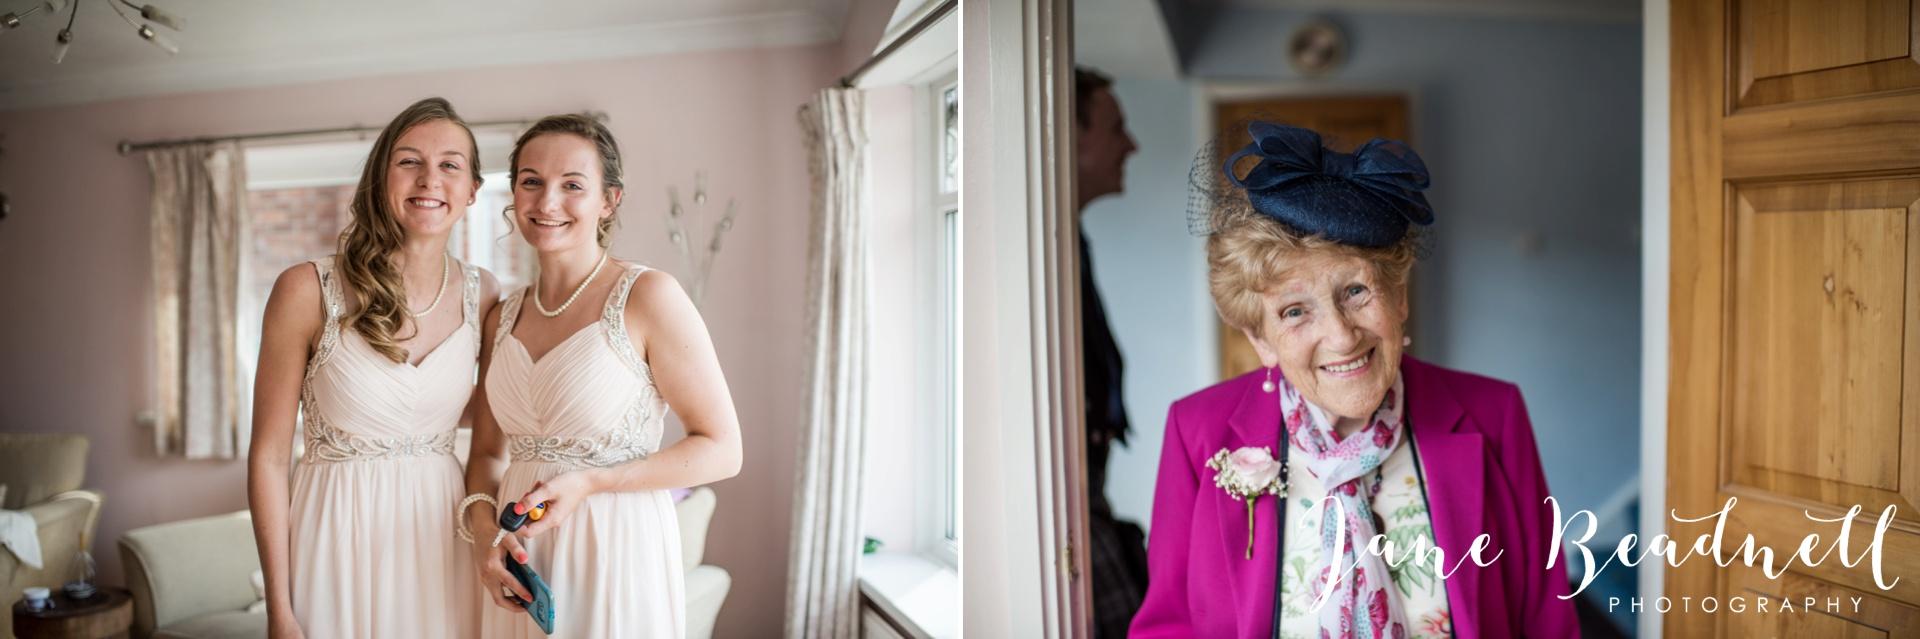 yorkshire-fine-art-wedding-photographer-jane-beadnell-photography-poppleton-york_0008